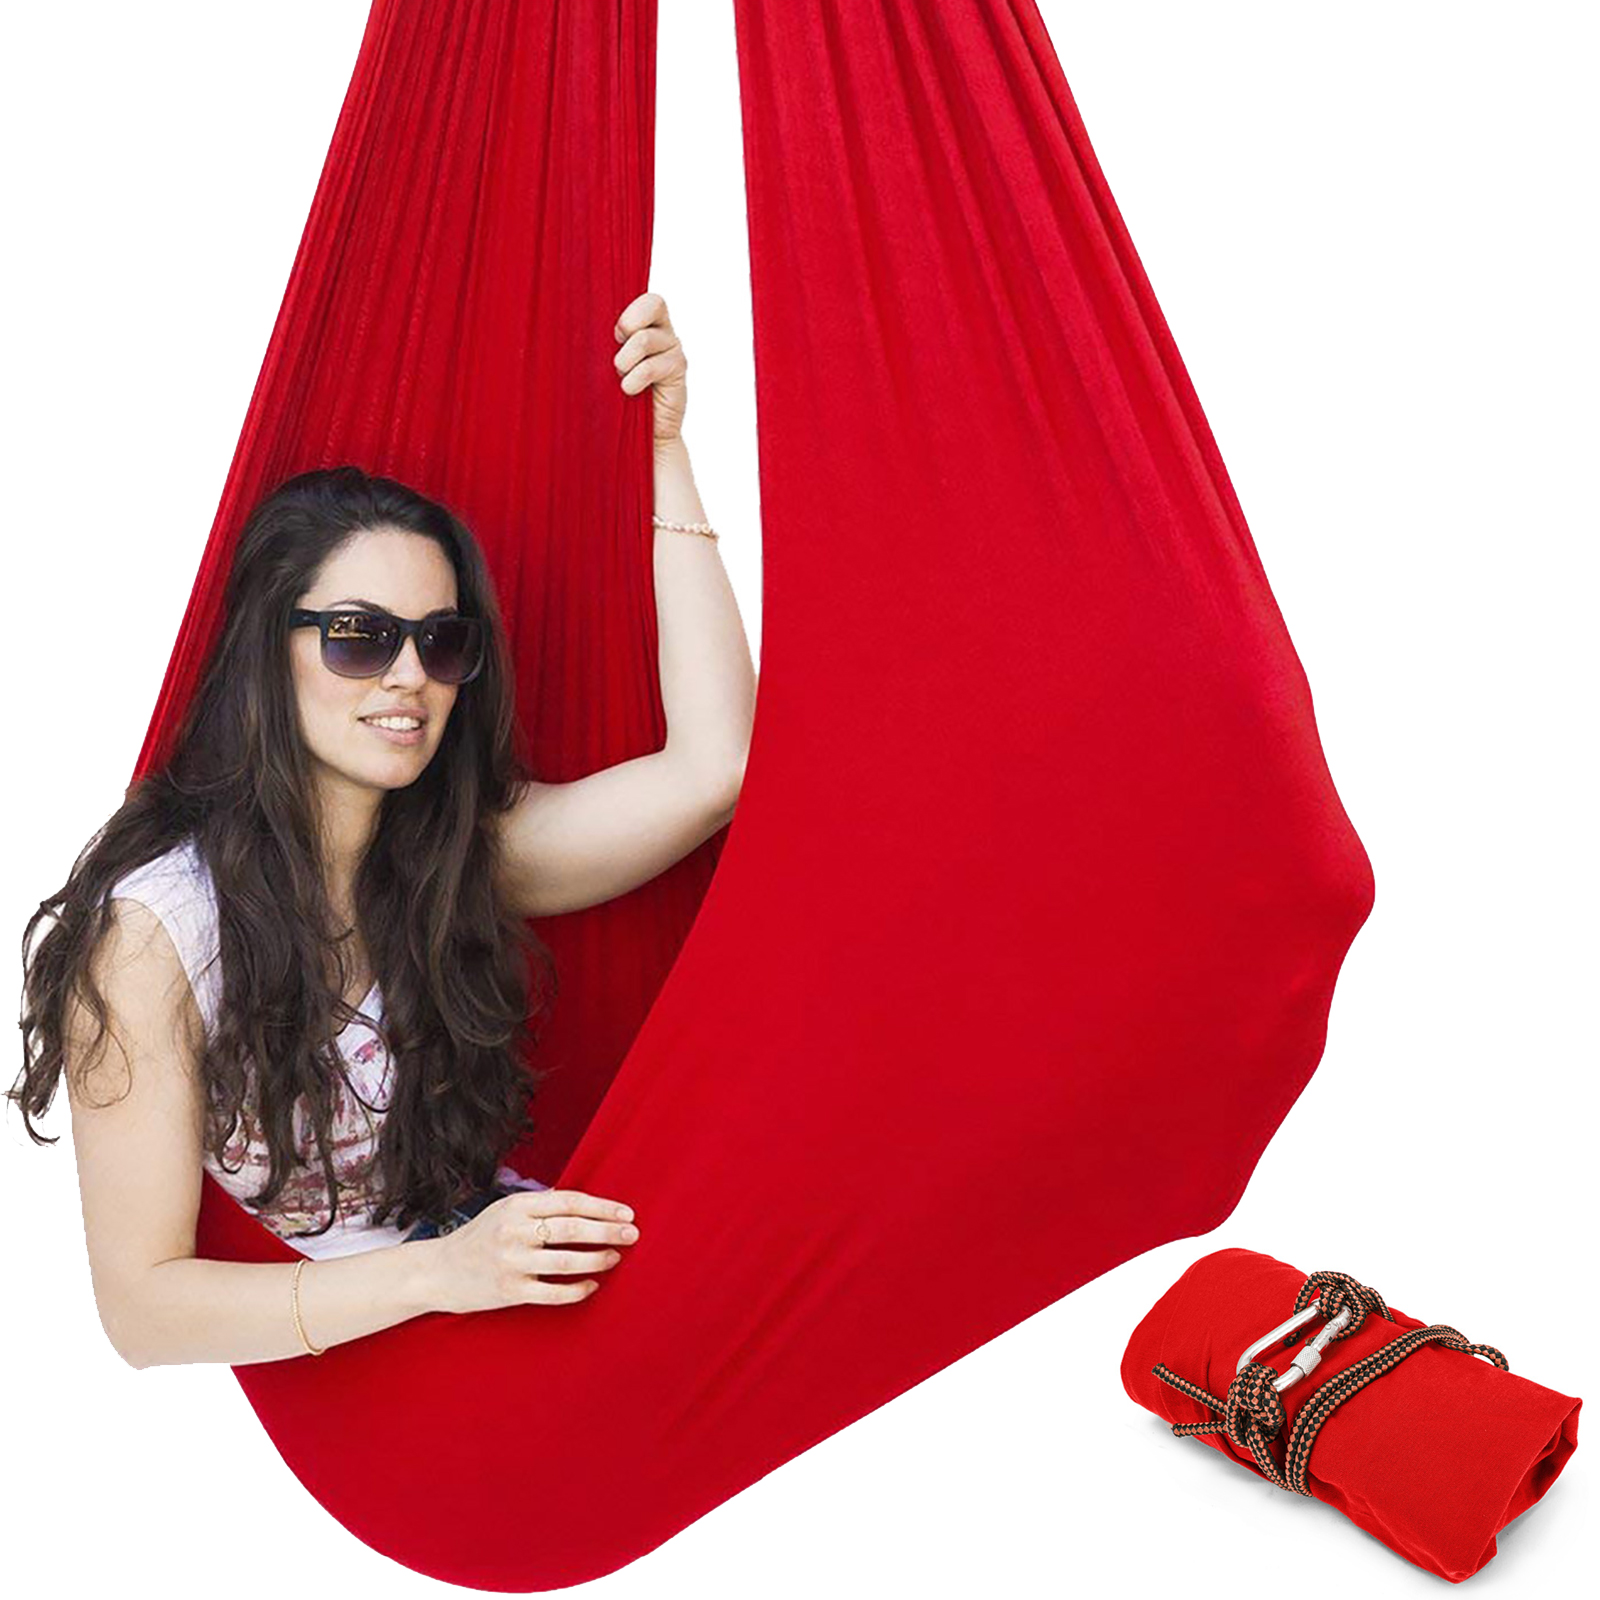 VEVOR Sensory Swing Chair Hanging Seat Adjustable Aerial Flying Yoga Hammock Sensory Hammock for Kids or Adults